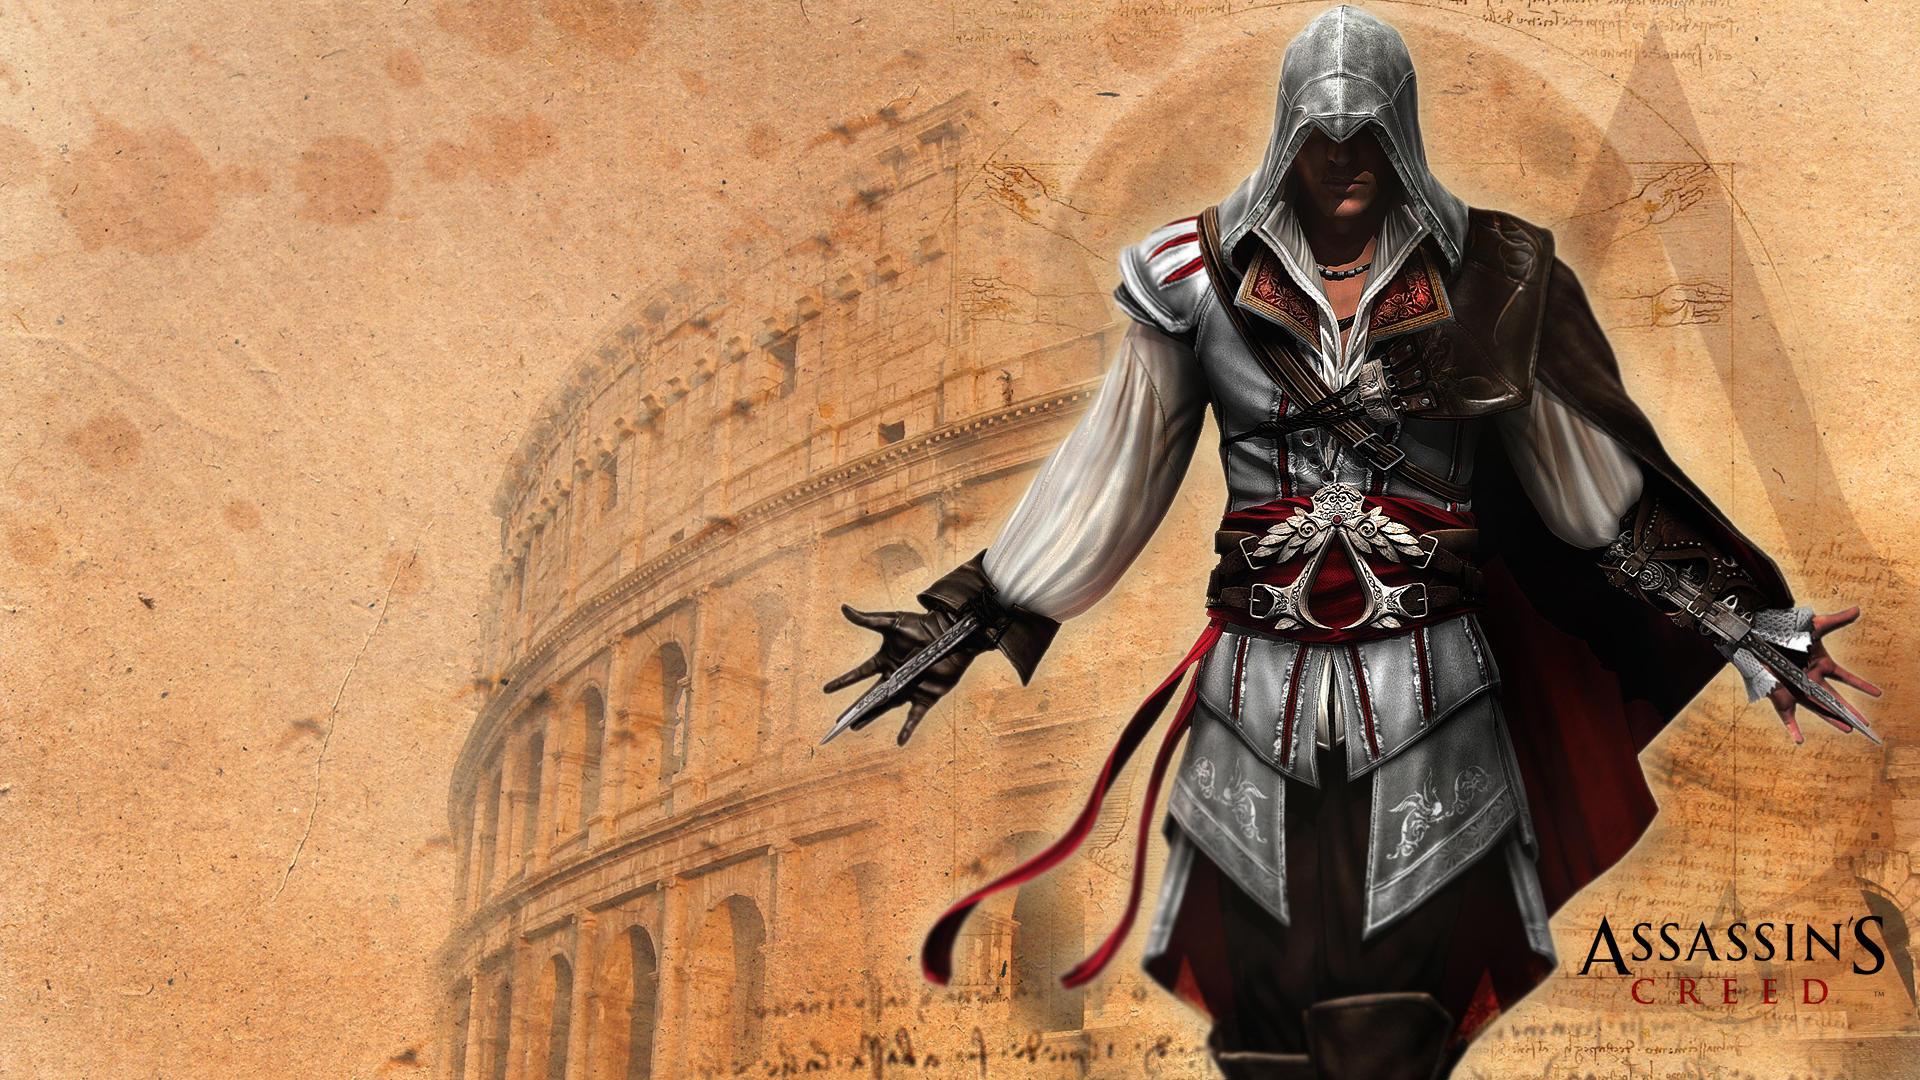 Assassins Creed Ezio wallpaper by messymedia